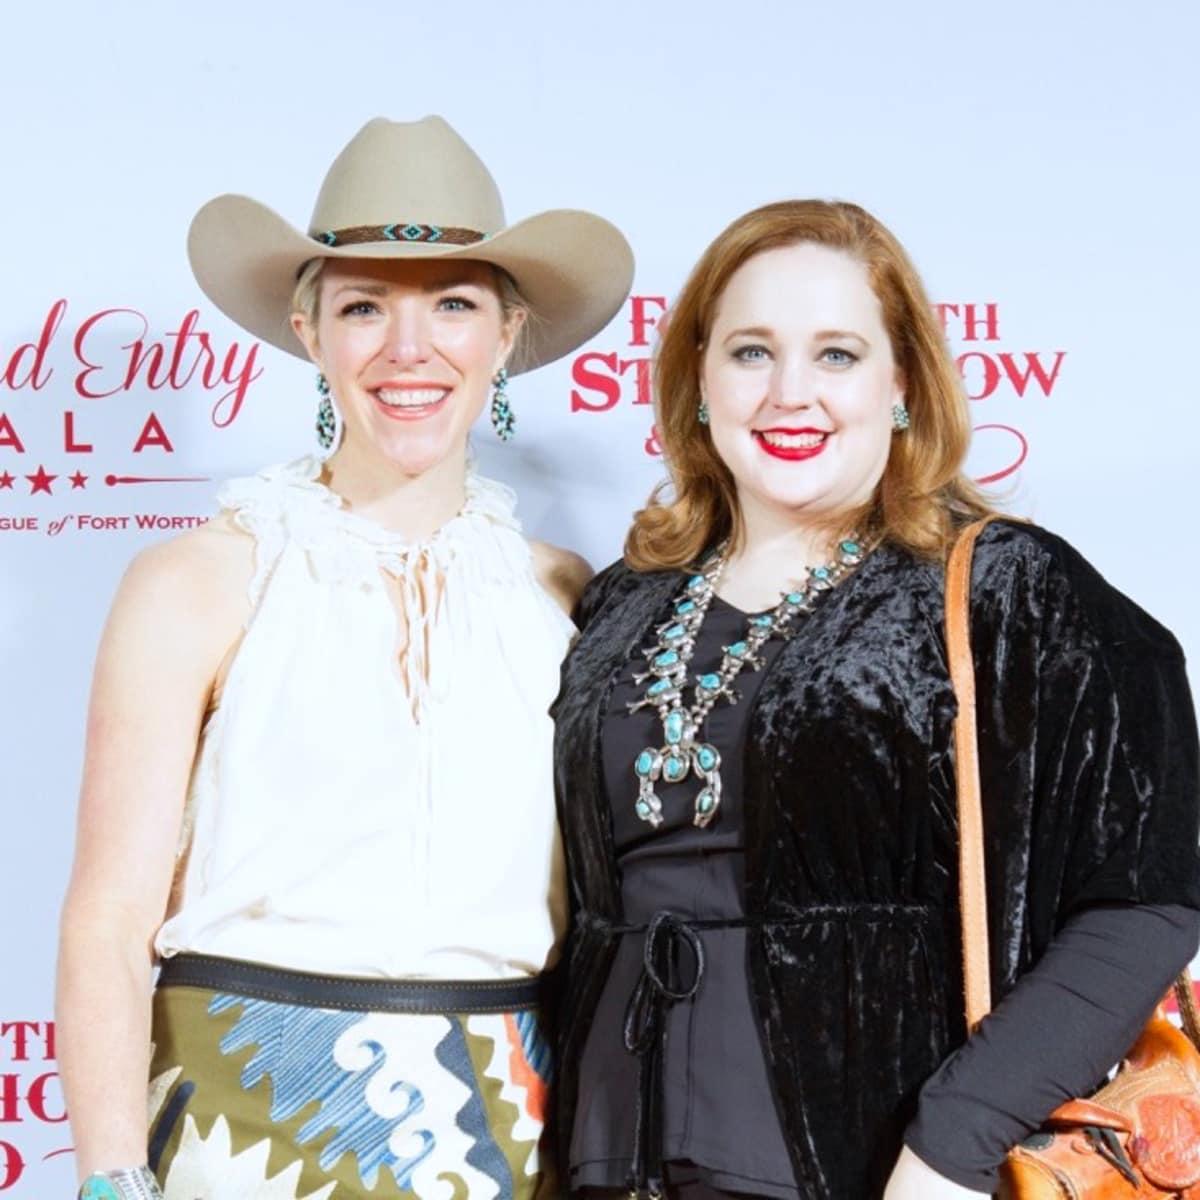 Fort Worth, JLH Grand Entry Gala, January 2018, Blair Walker, Susanna Bartolomei